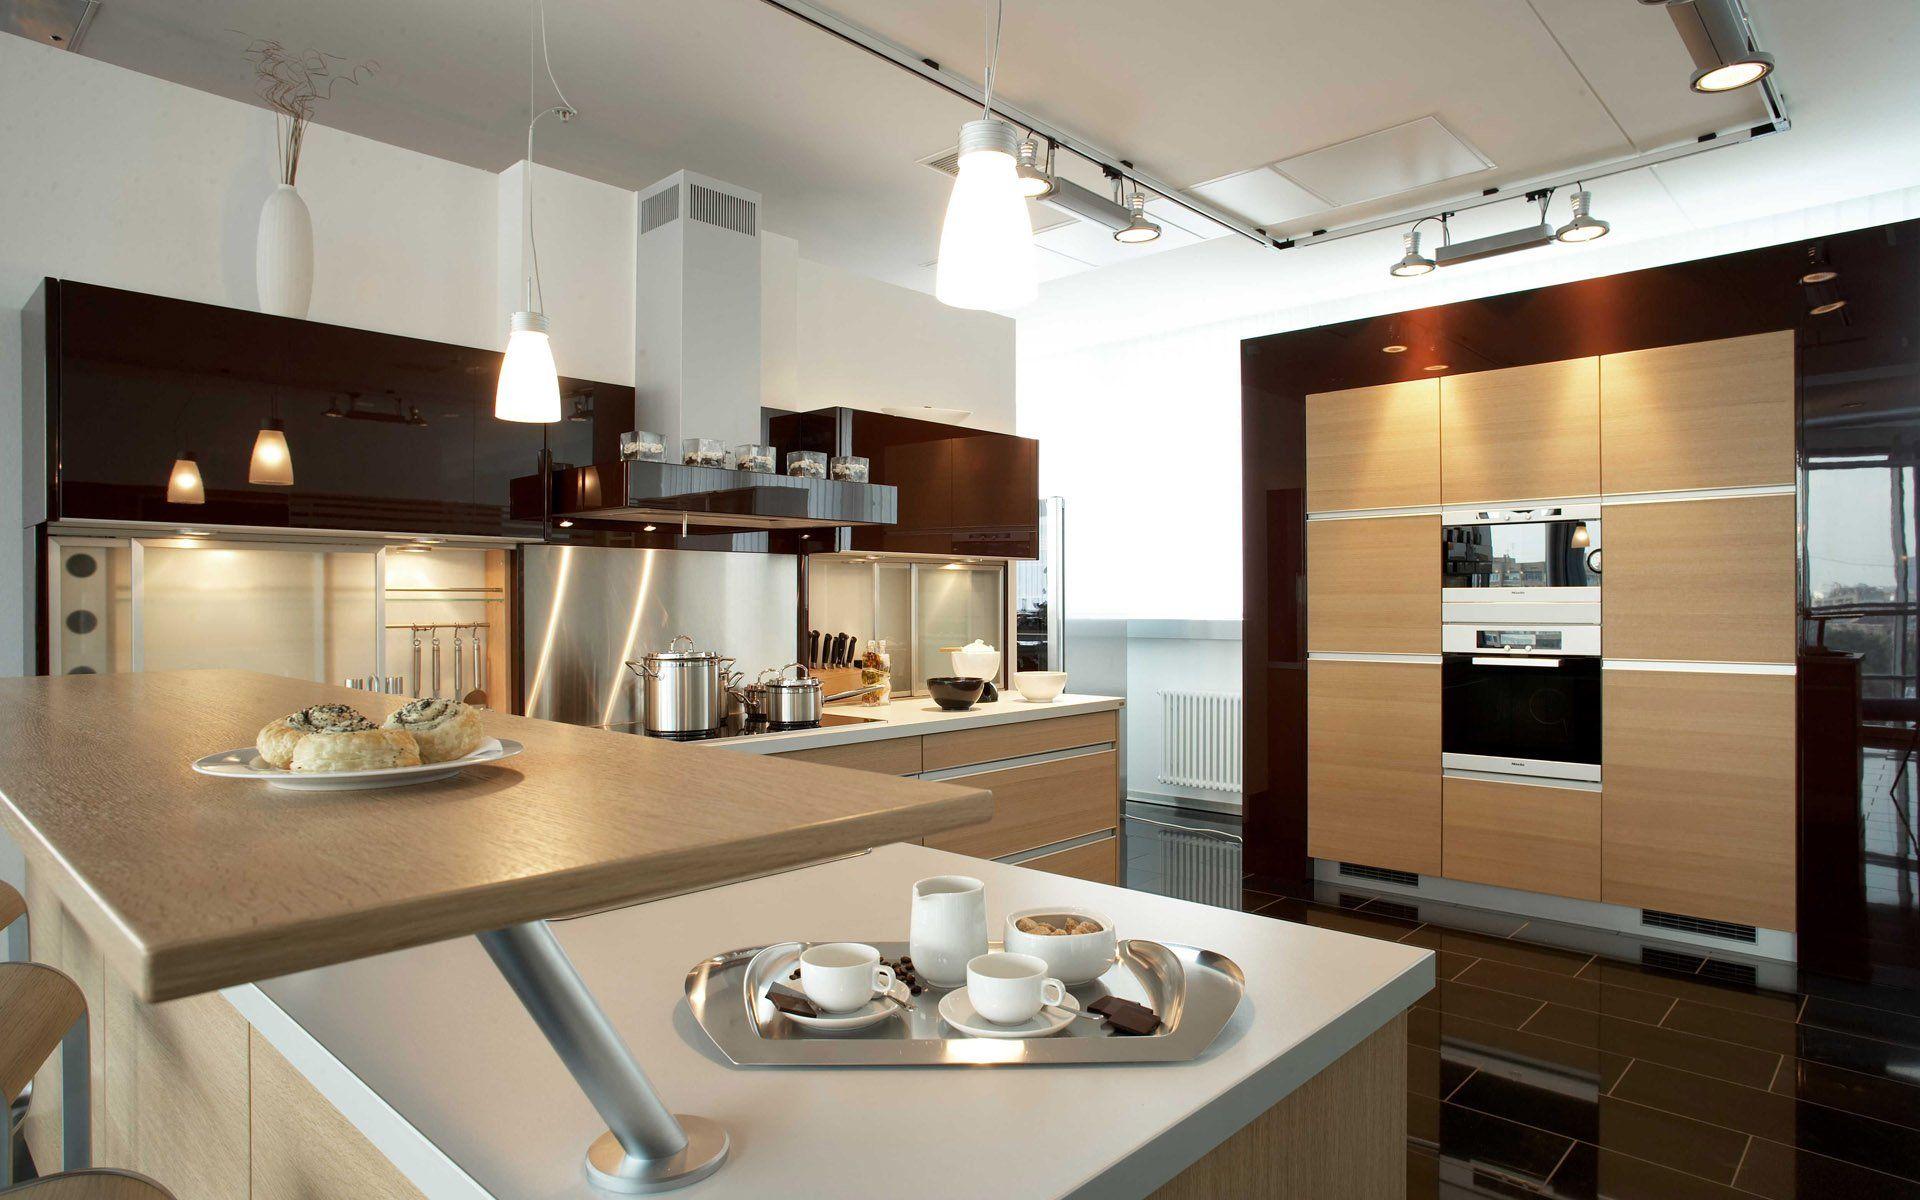 Download Free HD Kitchen Wallpaper Backgrounds for Desktop ...